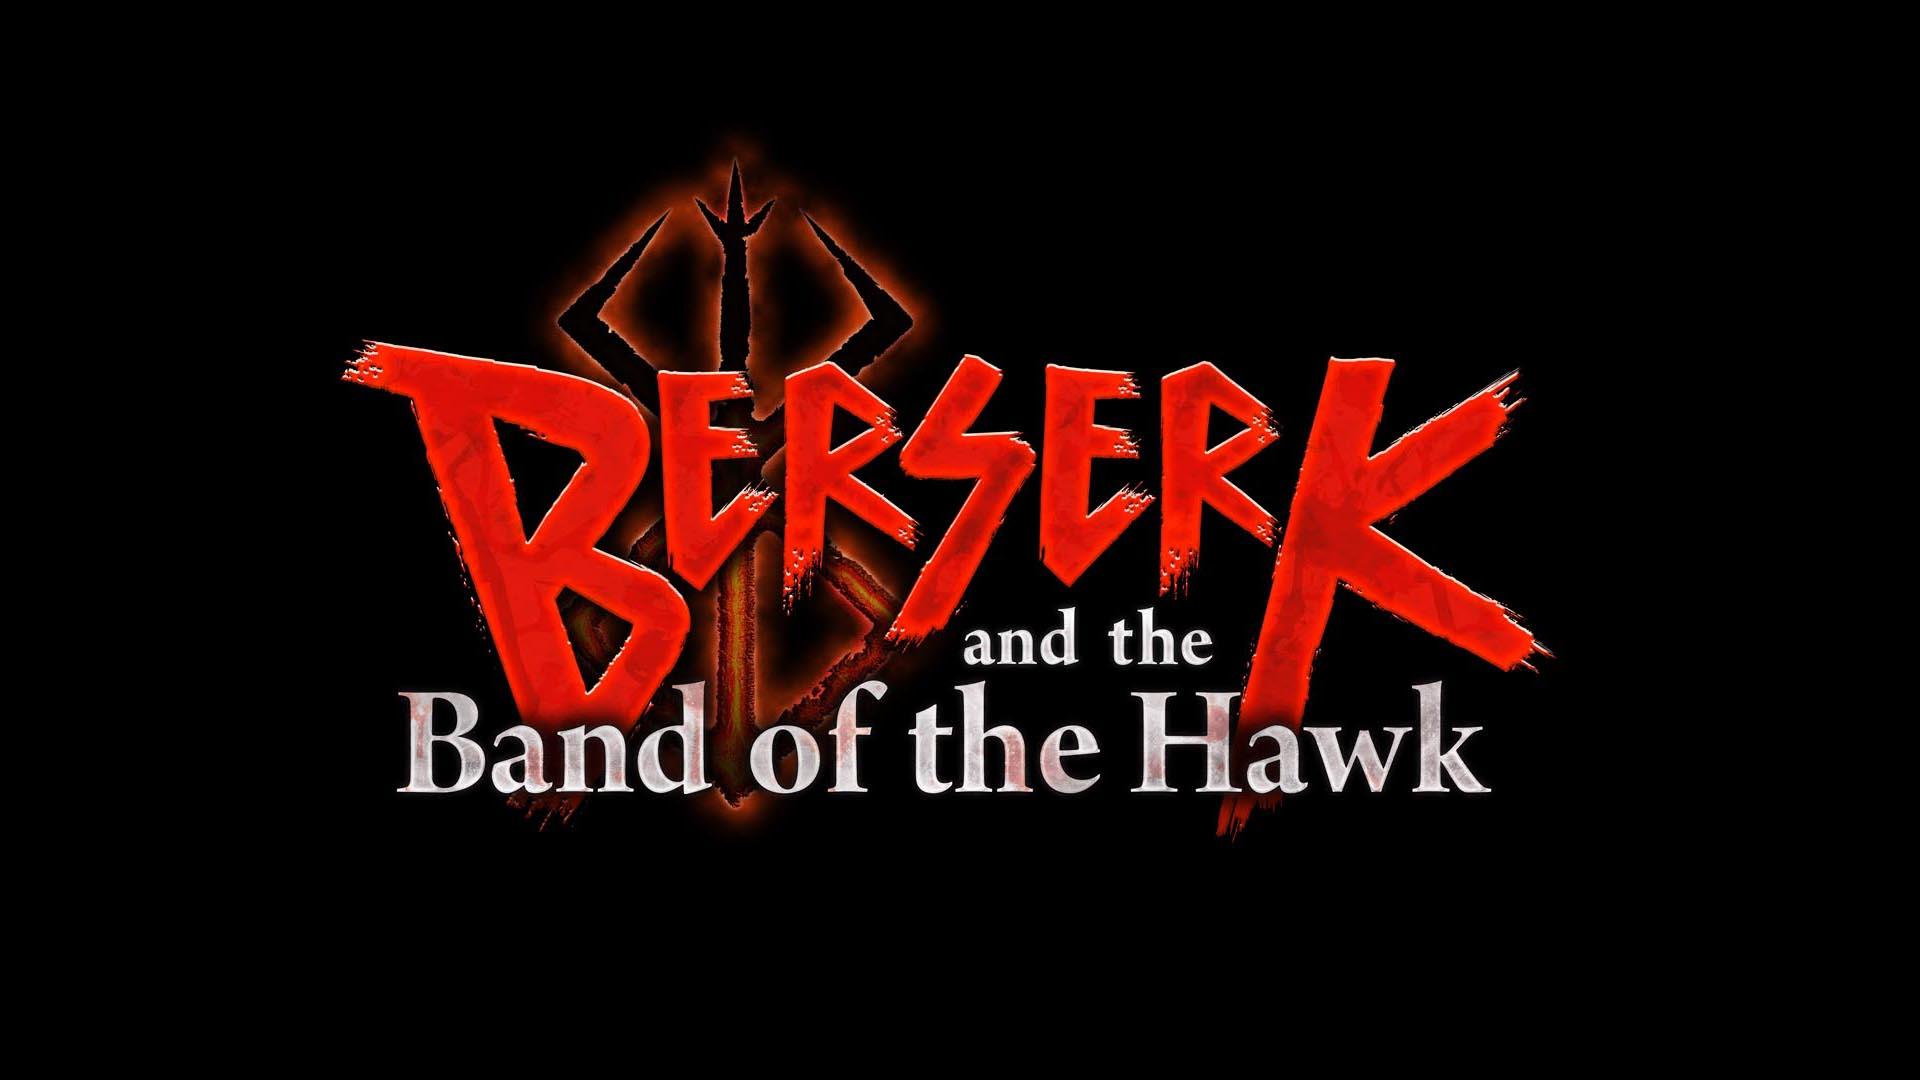 Berserk and the Band of the Hawk ab sofort im Handel erhältlich